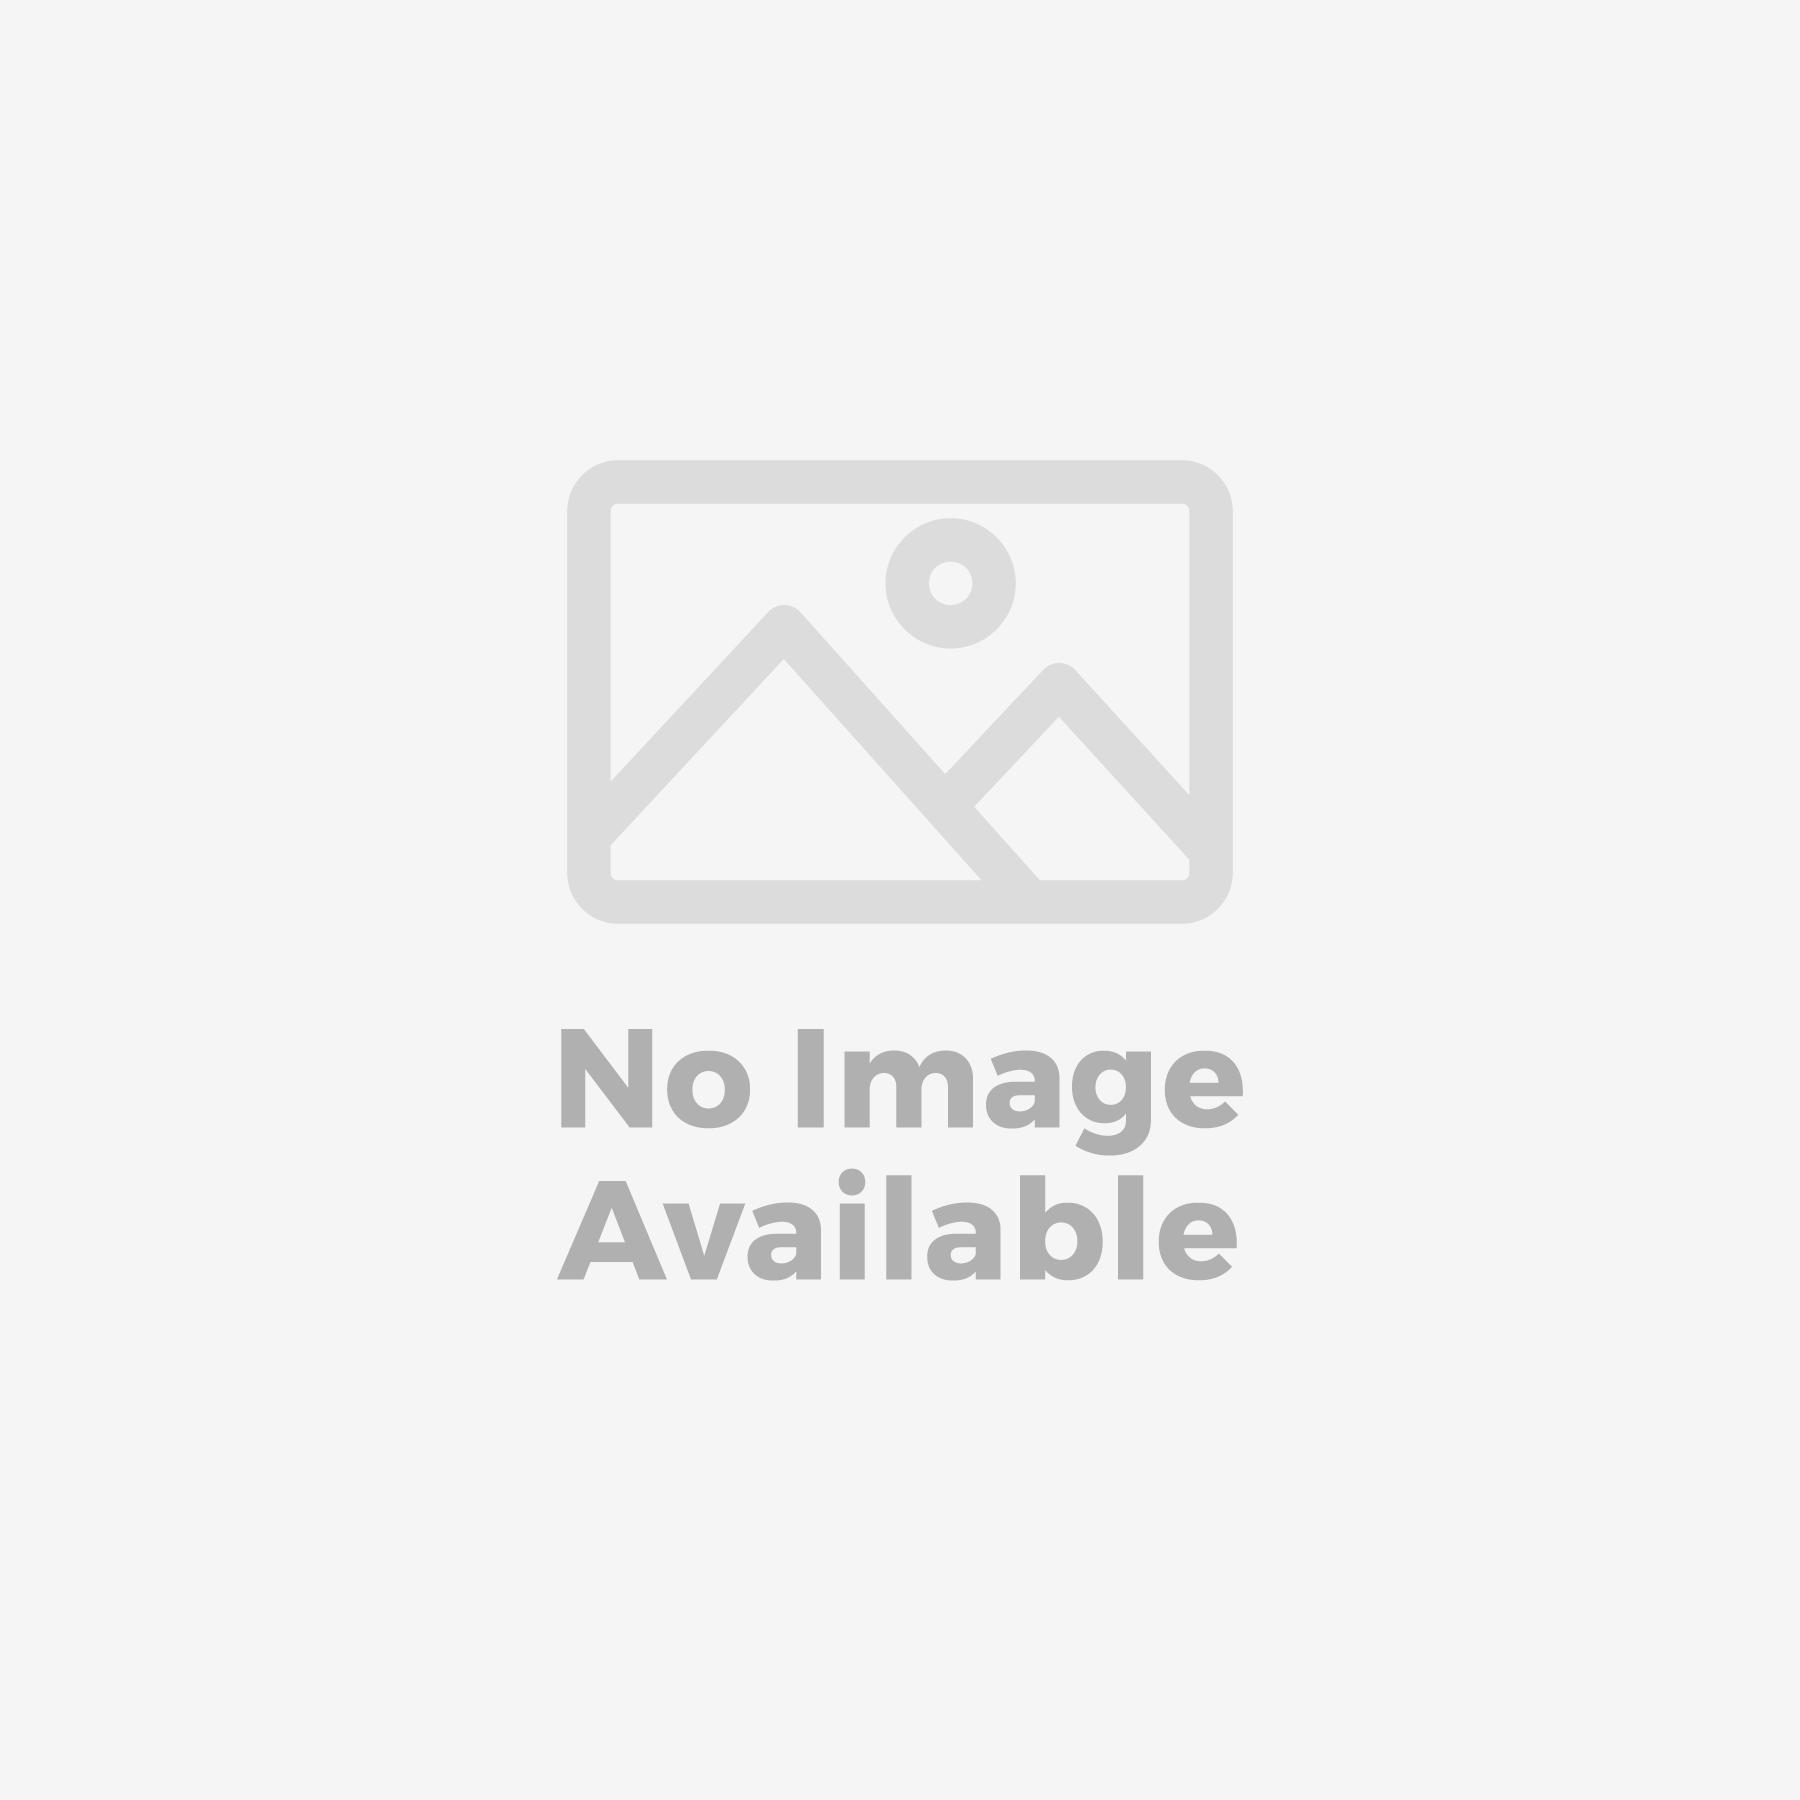 TRIPE TABLE LAMP